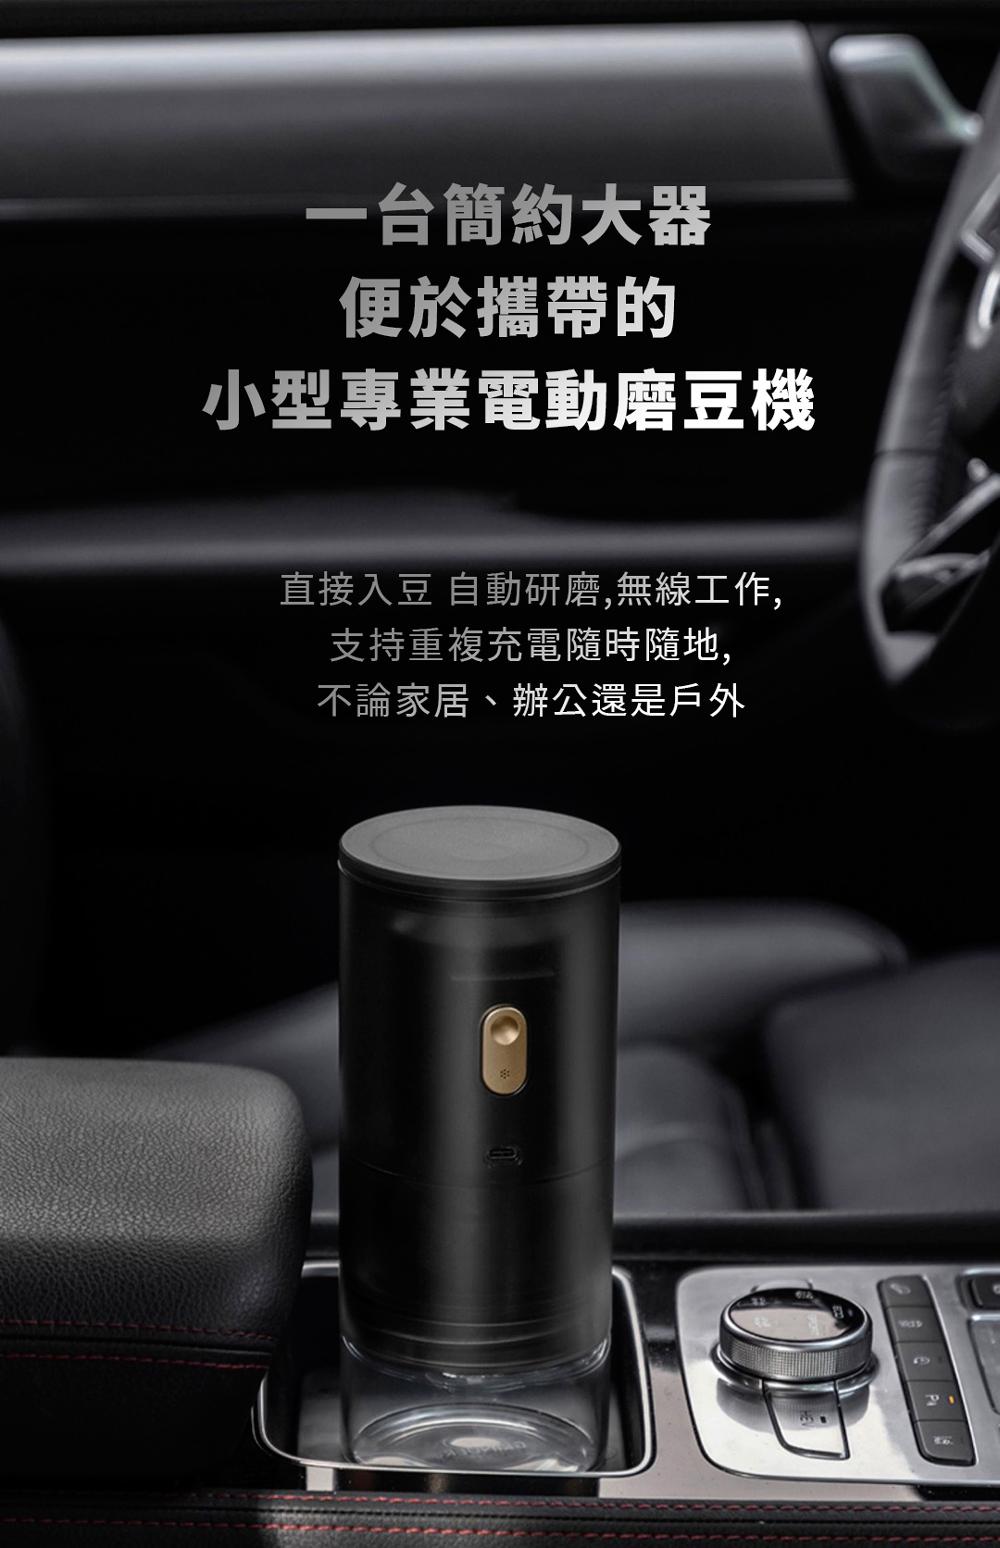 TIMEMORE 泰摩 GRINDER go 研磨師便攜式電動磨豆機(栗子go)